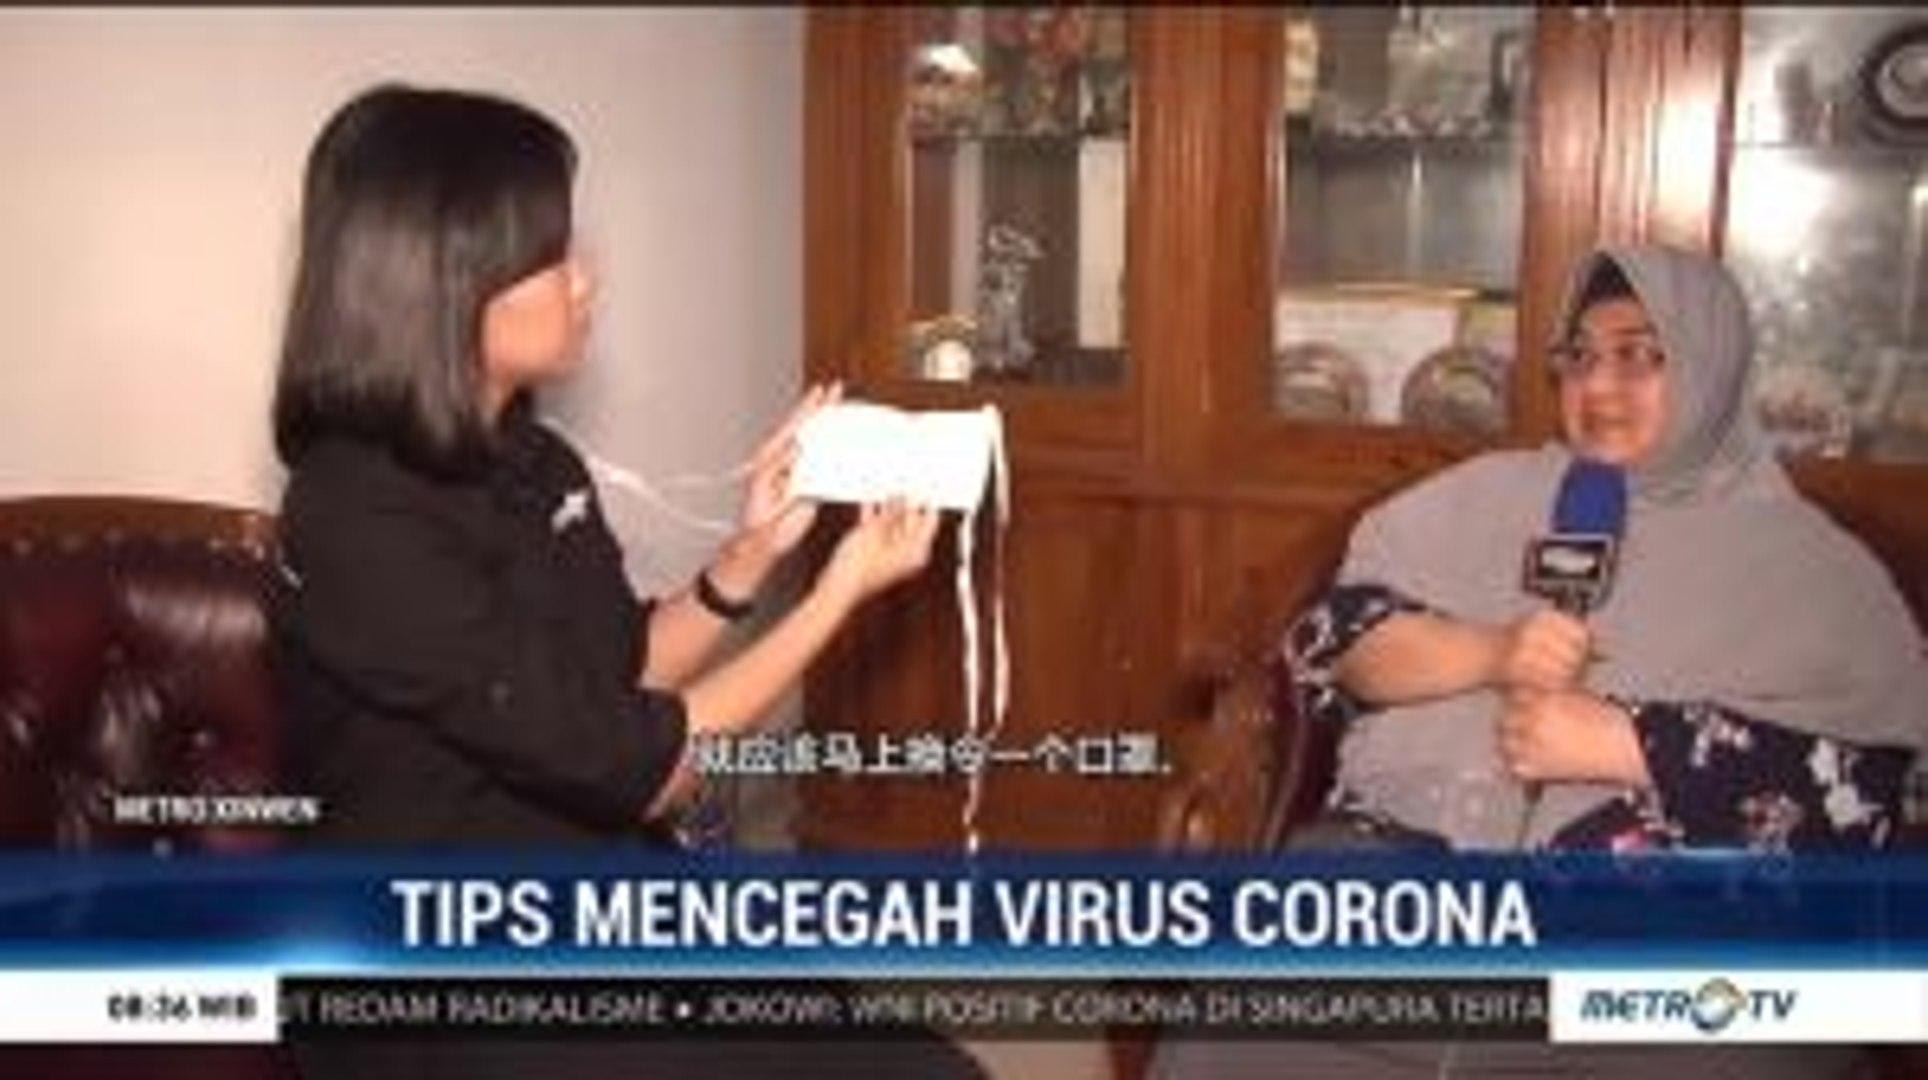 Tips Mencegah Virus Corona